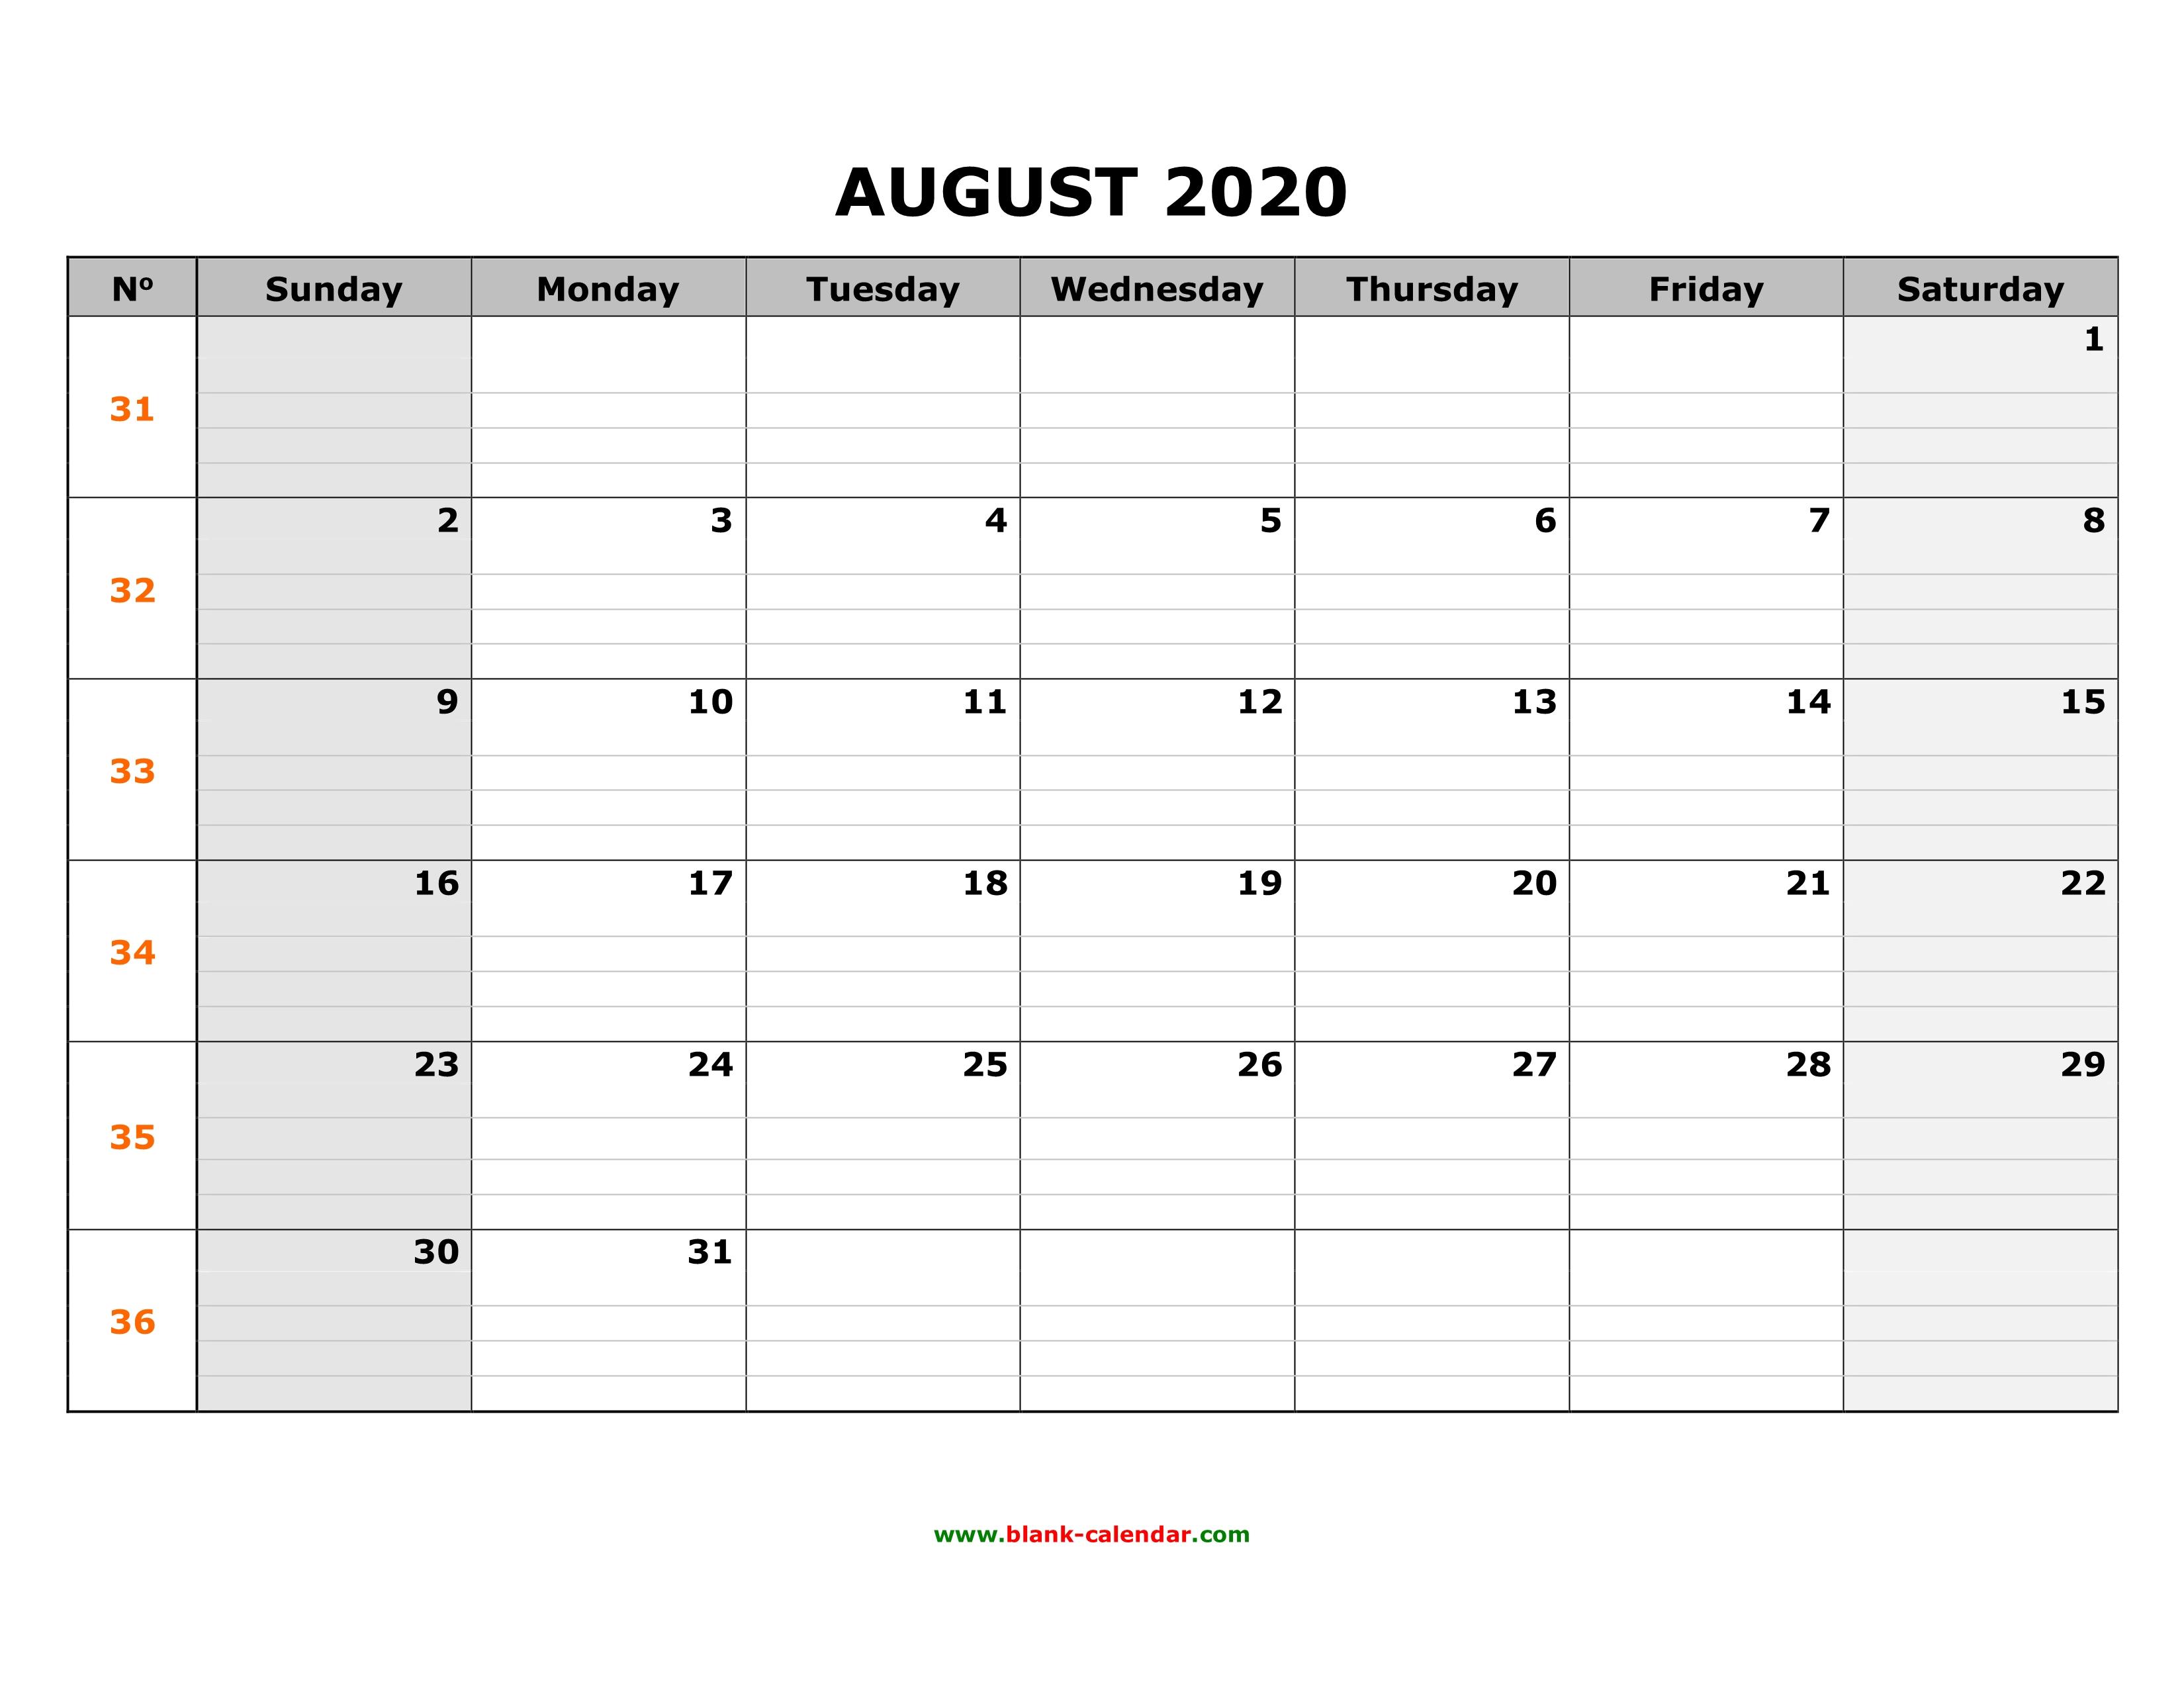 Blank Calendar August 2020.Free Download Printable August 2020 Calendar Large Box Grid Space